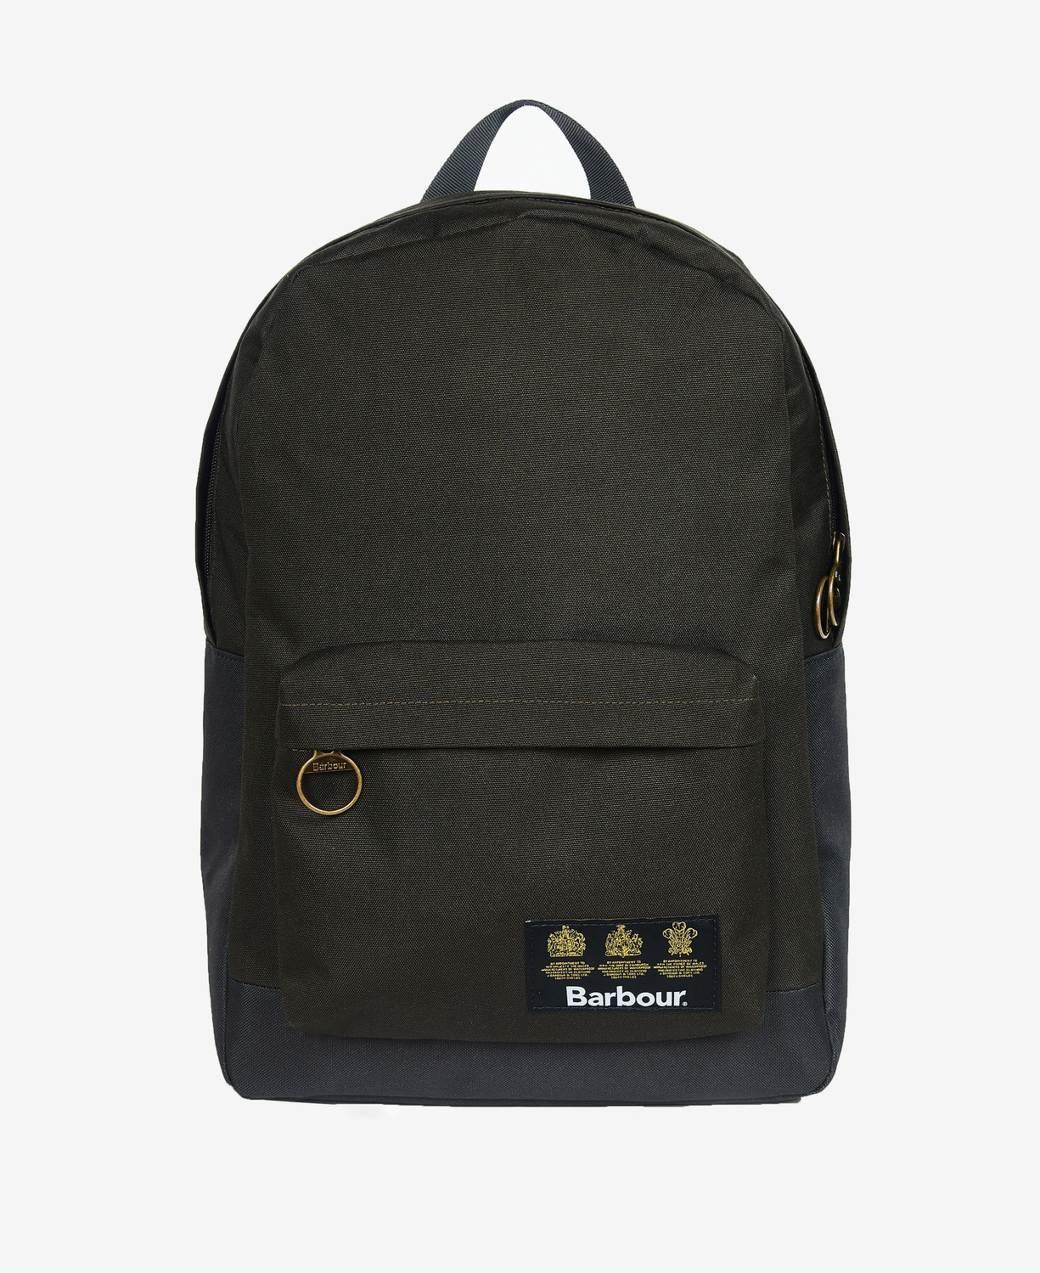 Barbour Highfield Canvas Backpack  Navy/Olive-1